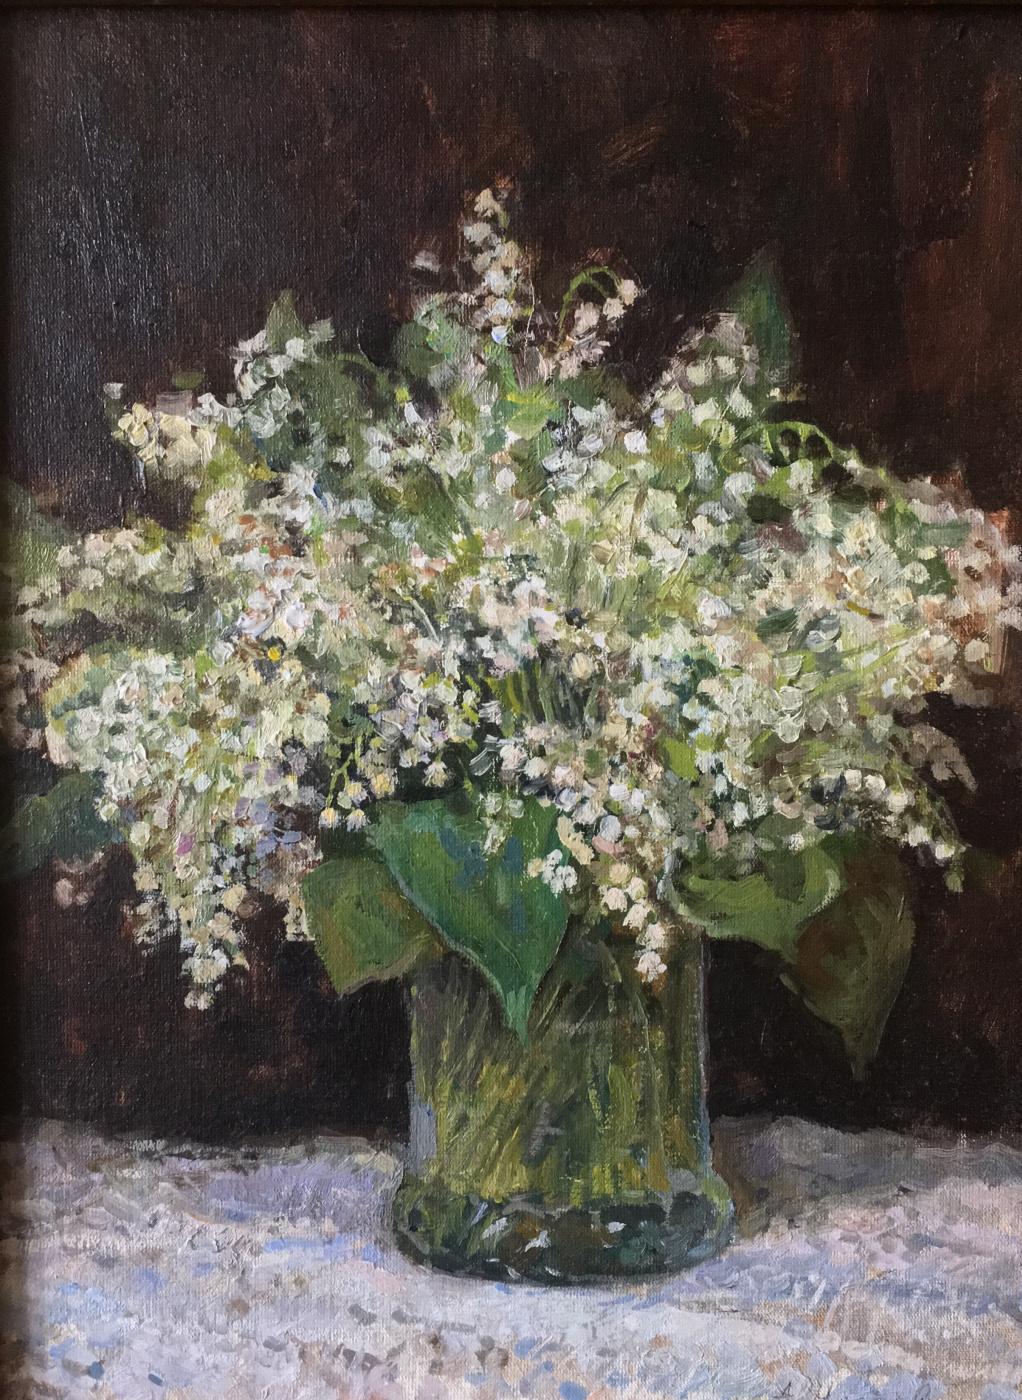 Aleksandr Chagadaev. Lilies of the valley